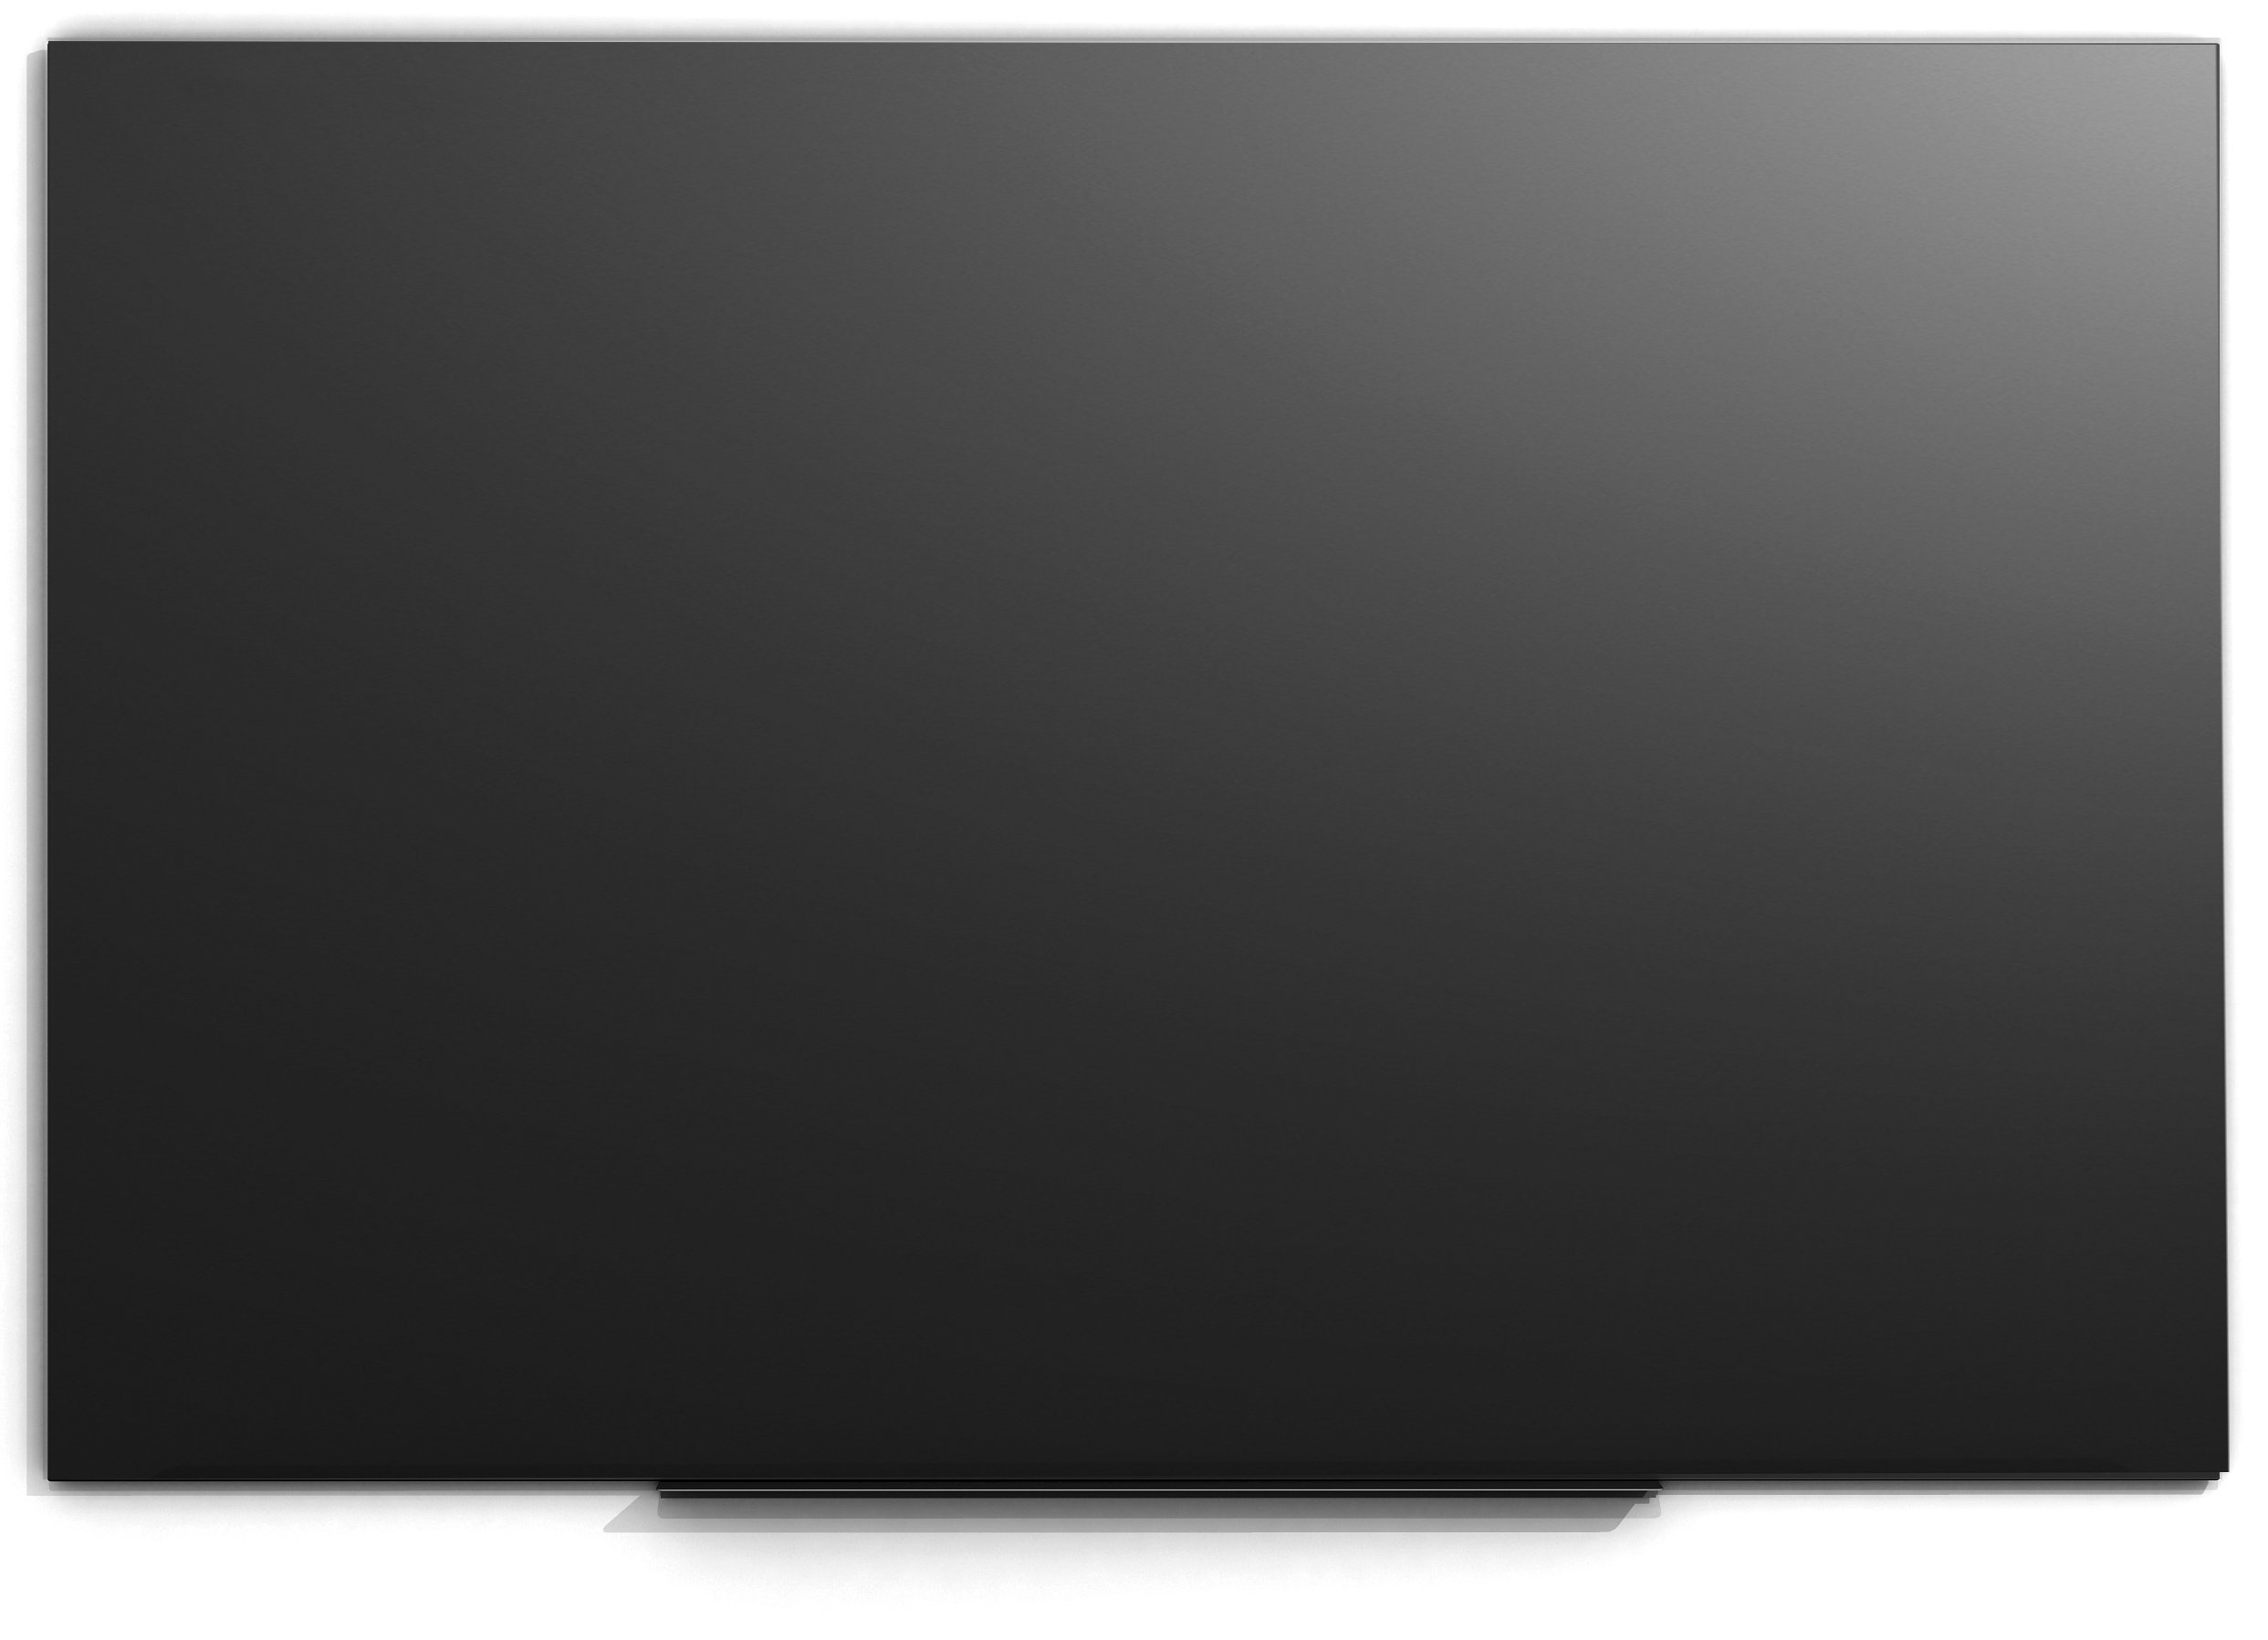 ROCADA Magnetic Skin Chalkboard, 39.5 x 59 x 0.6 Inches, Frameless, Black (RD-6821R)